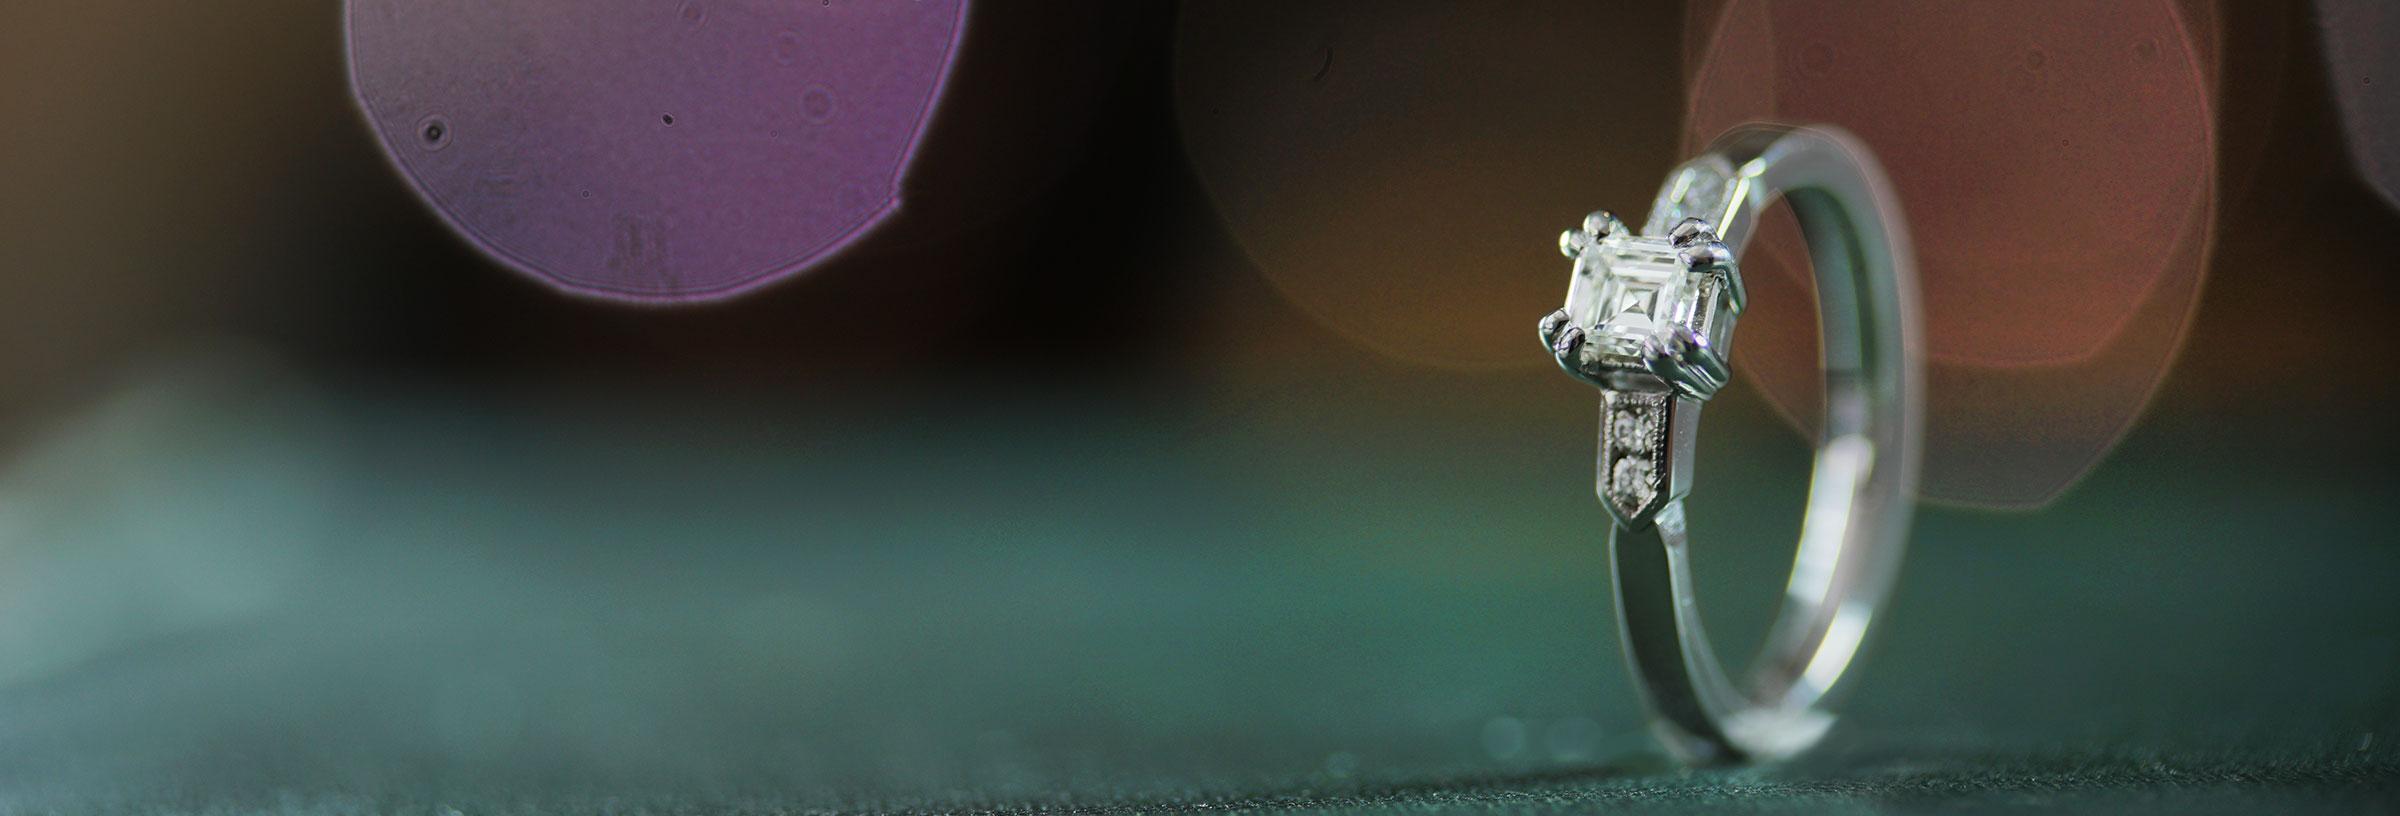 palladium-carre-cut-diamond-with-geometric-shoulder-detailing